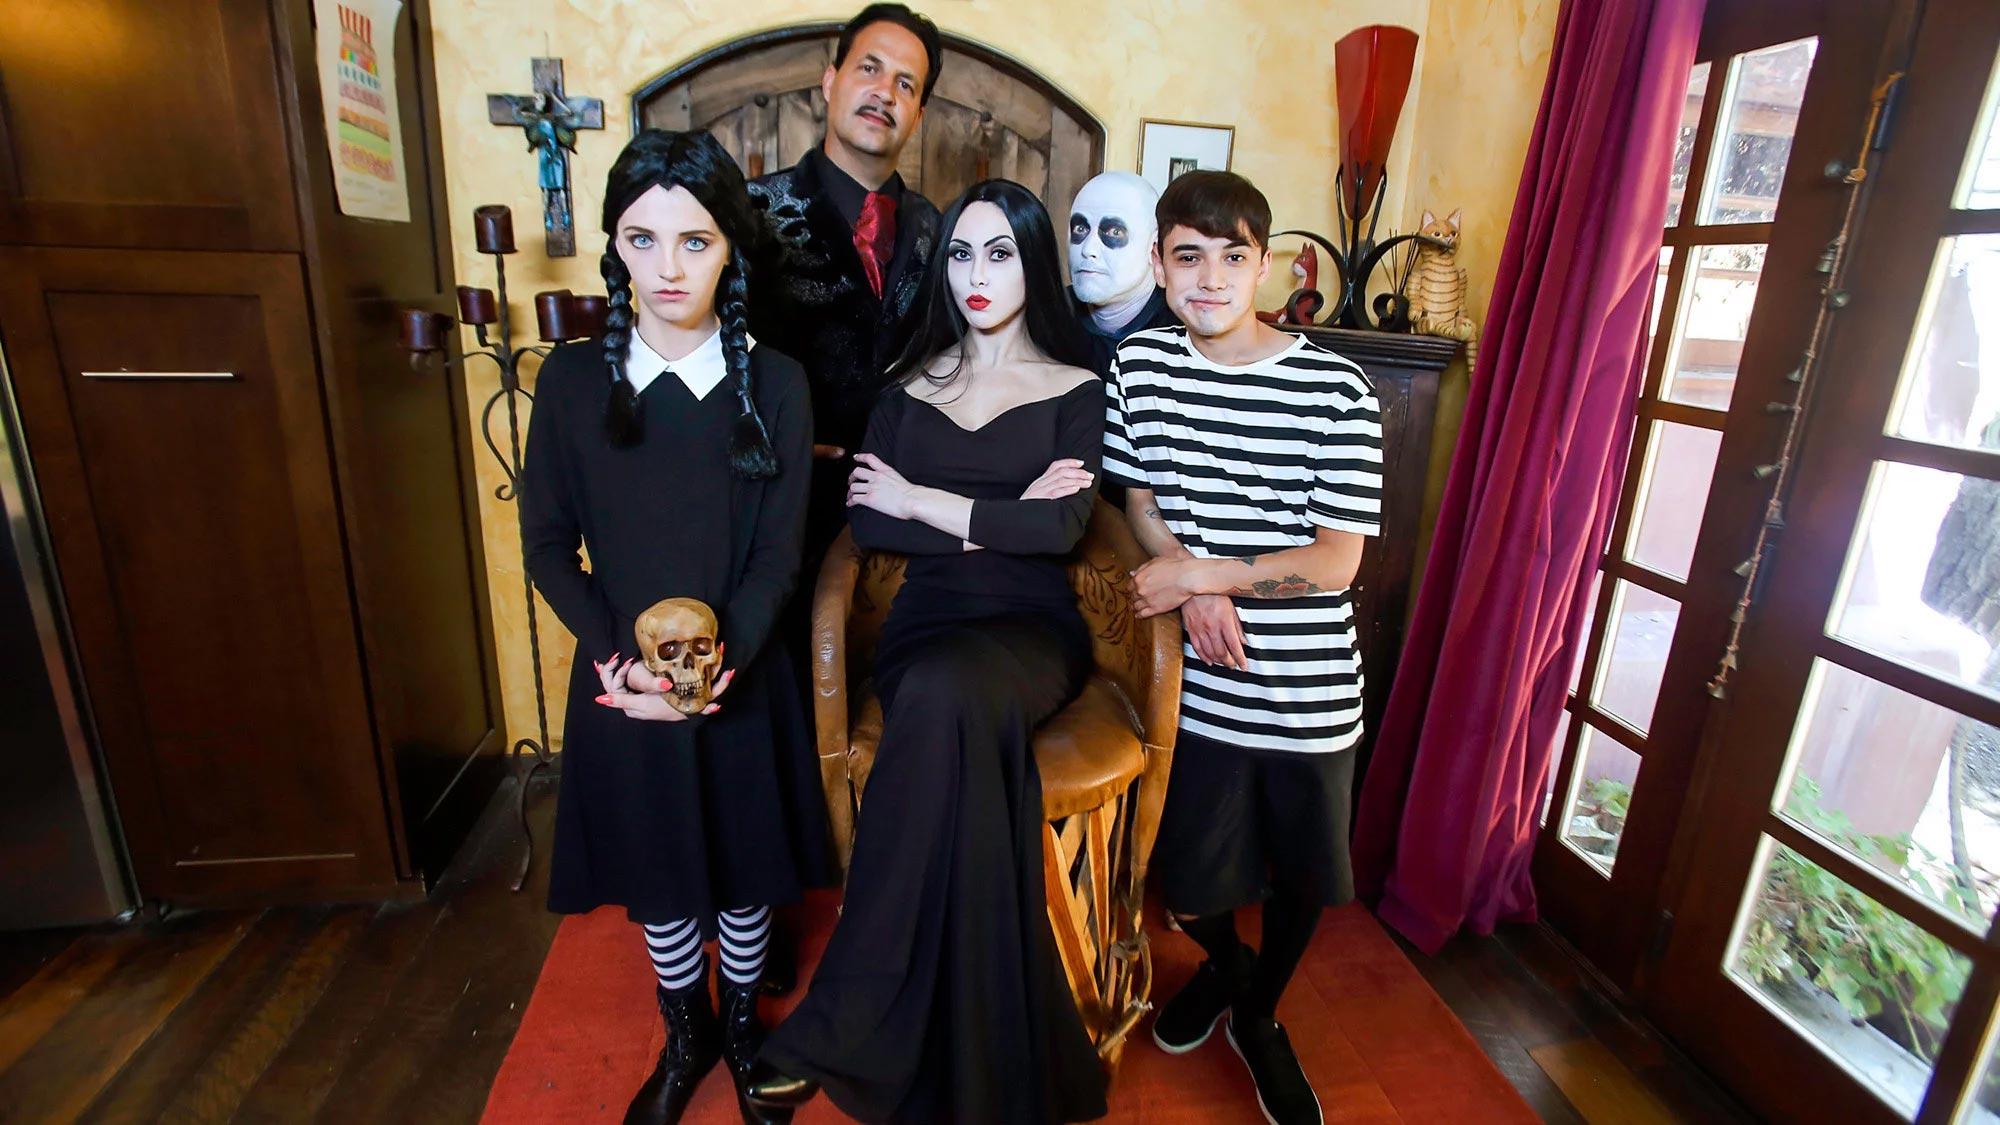 Addams Family Porn addams family sex orgy - the addams family step sex scene